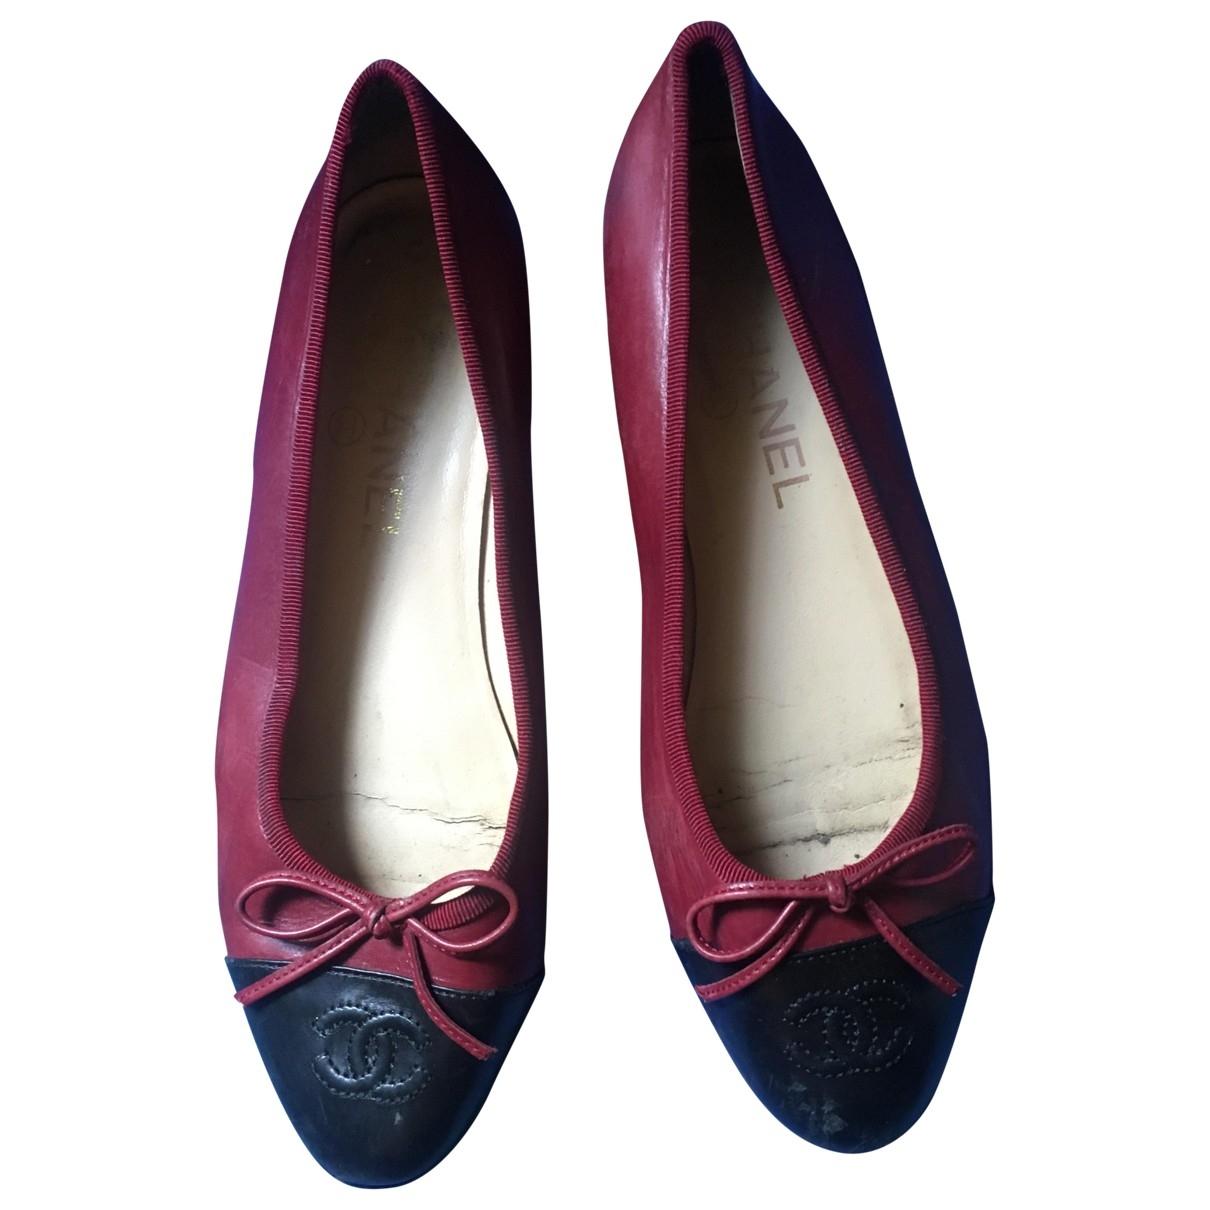 Chanel \N Burgundy Leather Ballet flats for Women 37 EU